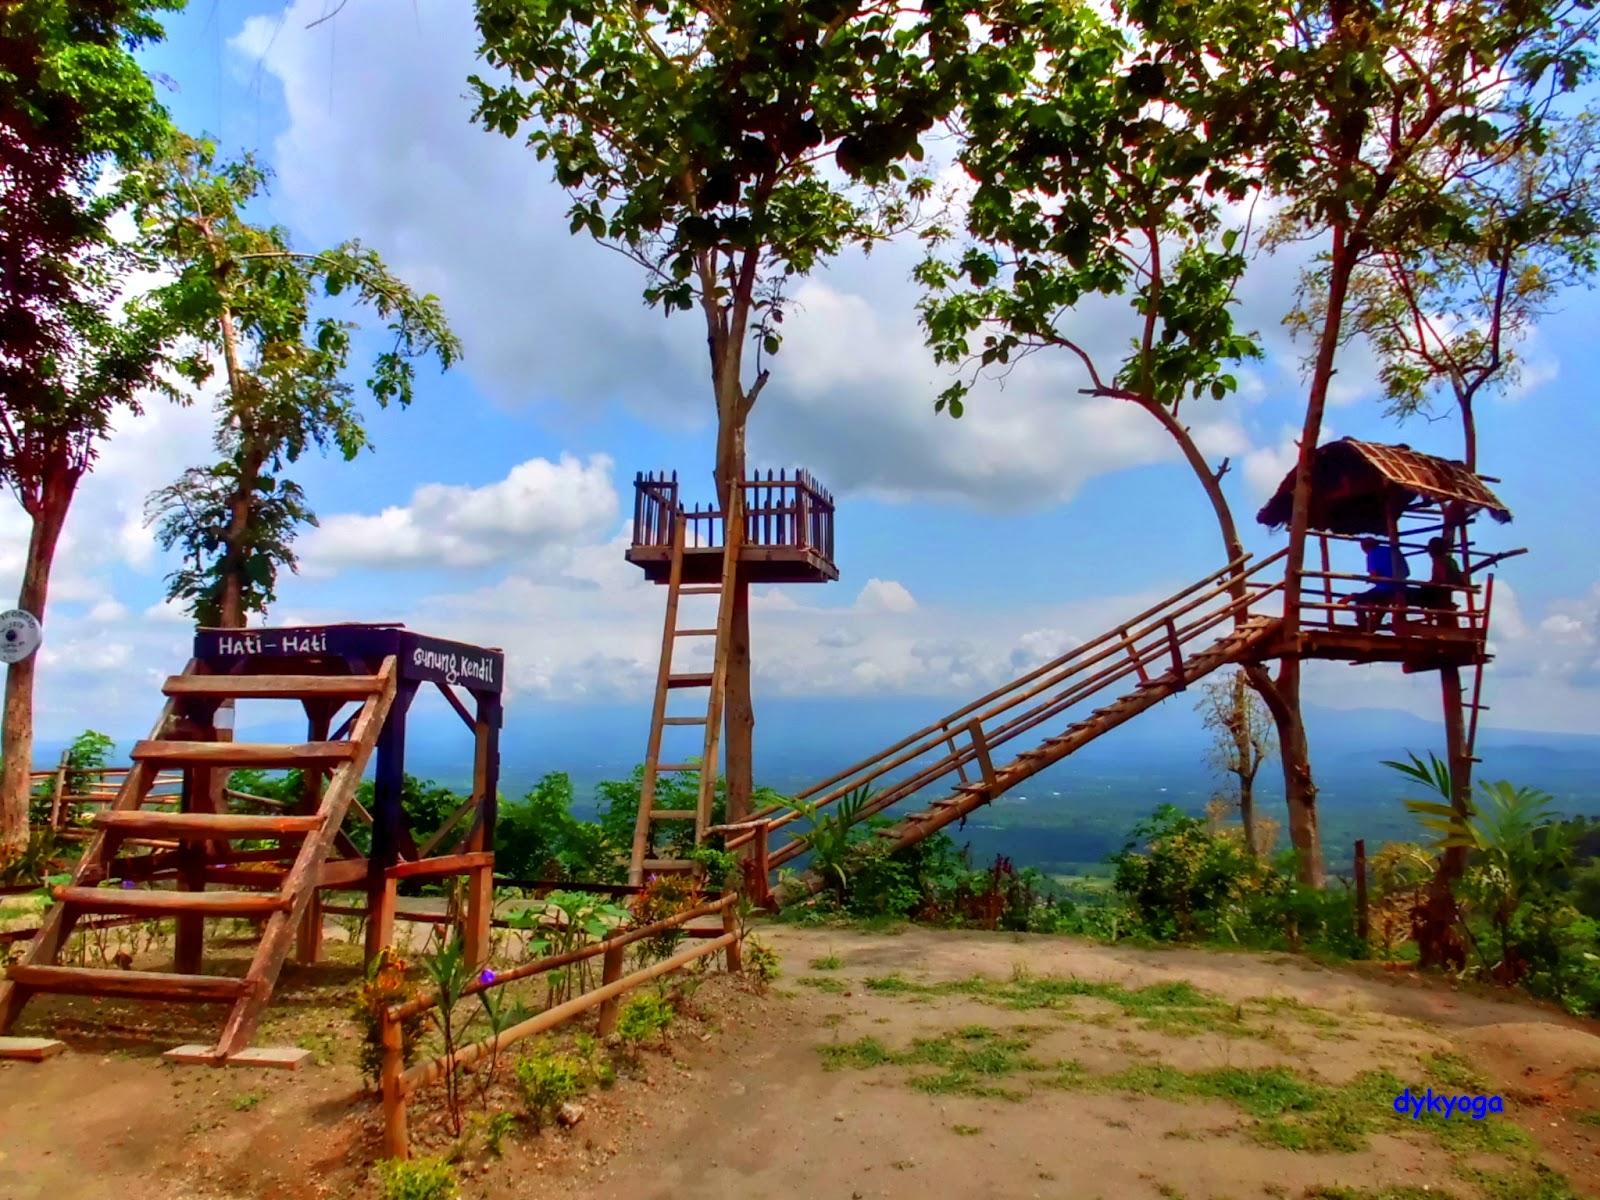 Kendill Hill Pesona Gupakan Kendil Desa Wisata Giritengah Borobudur Magelang